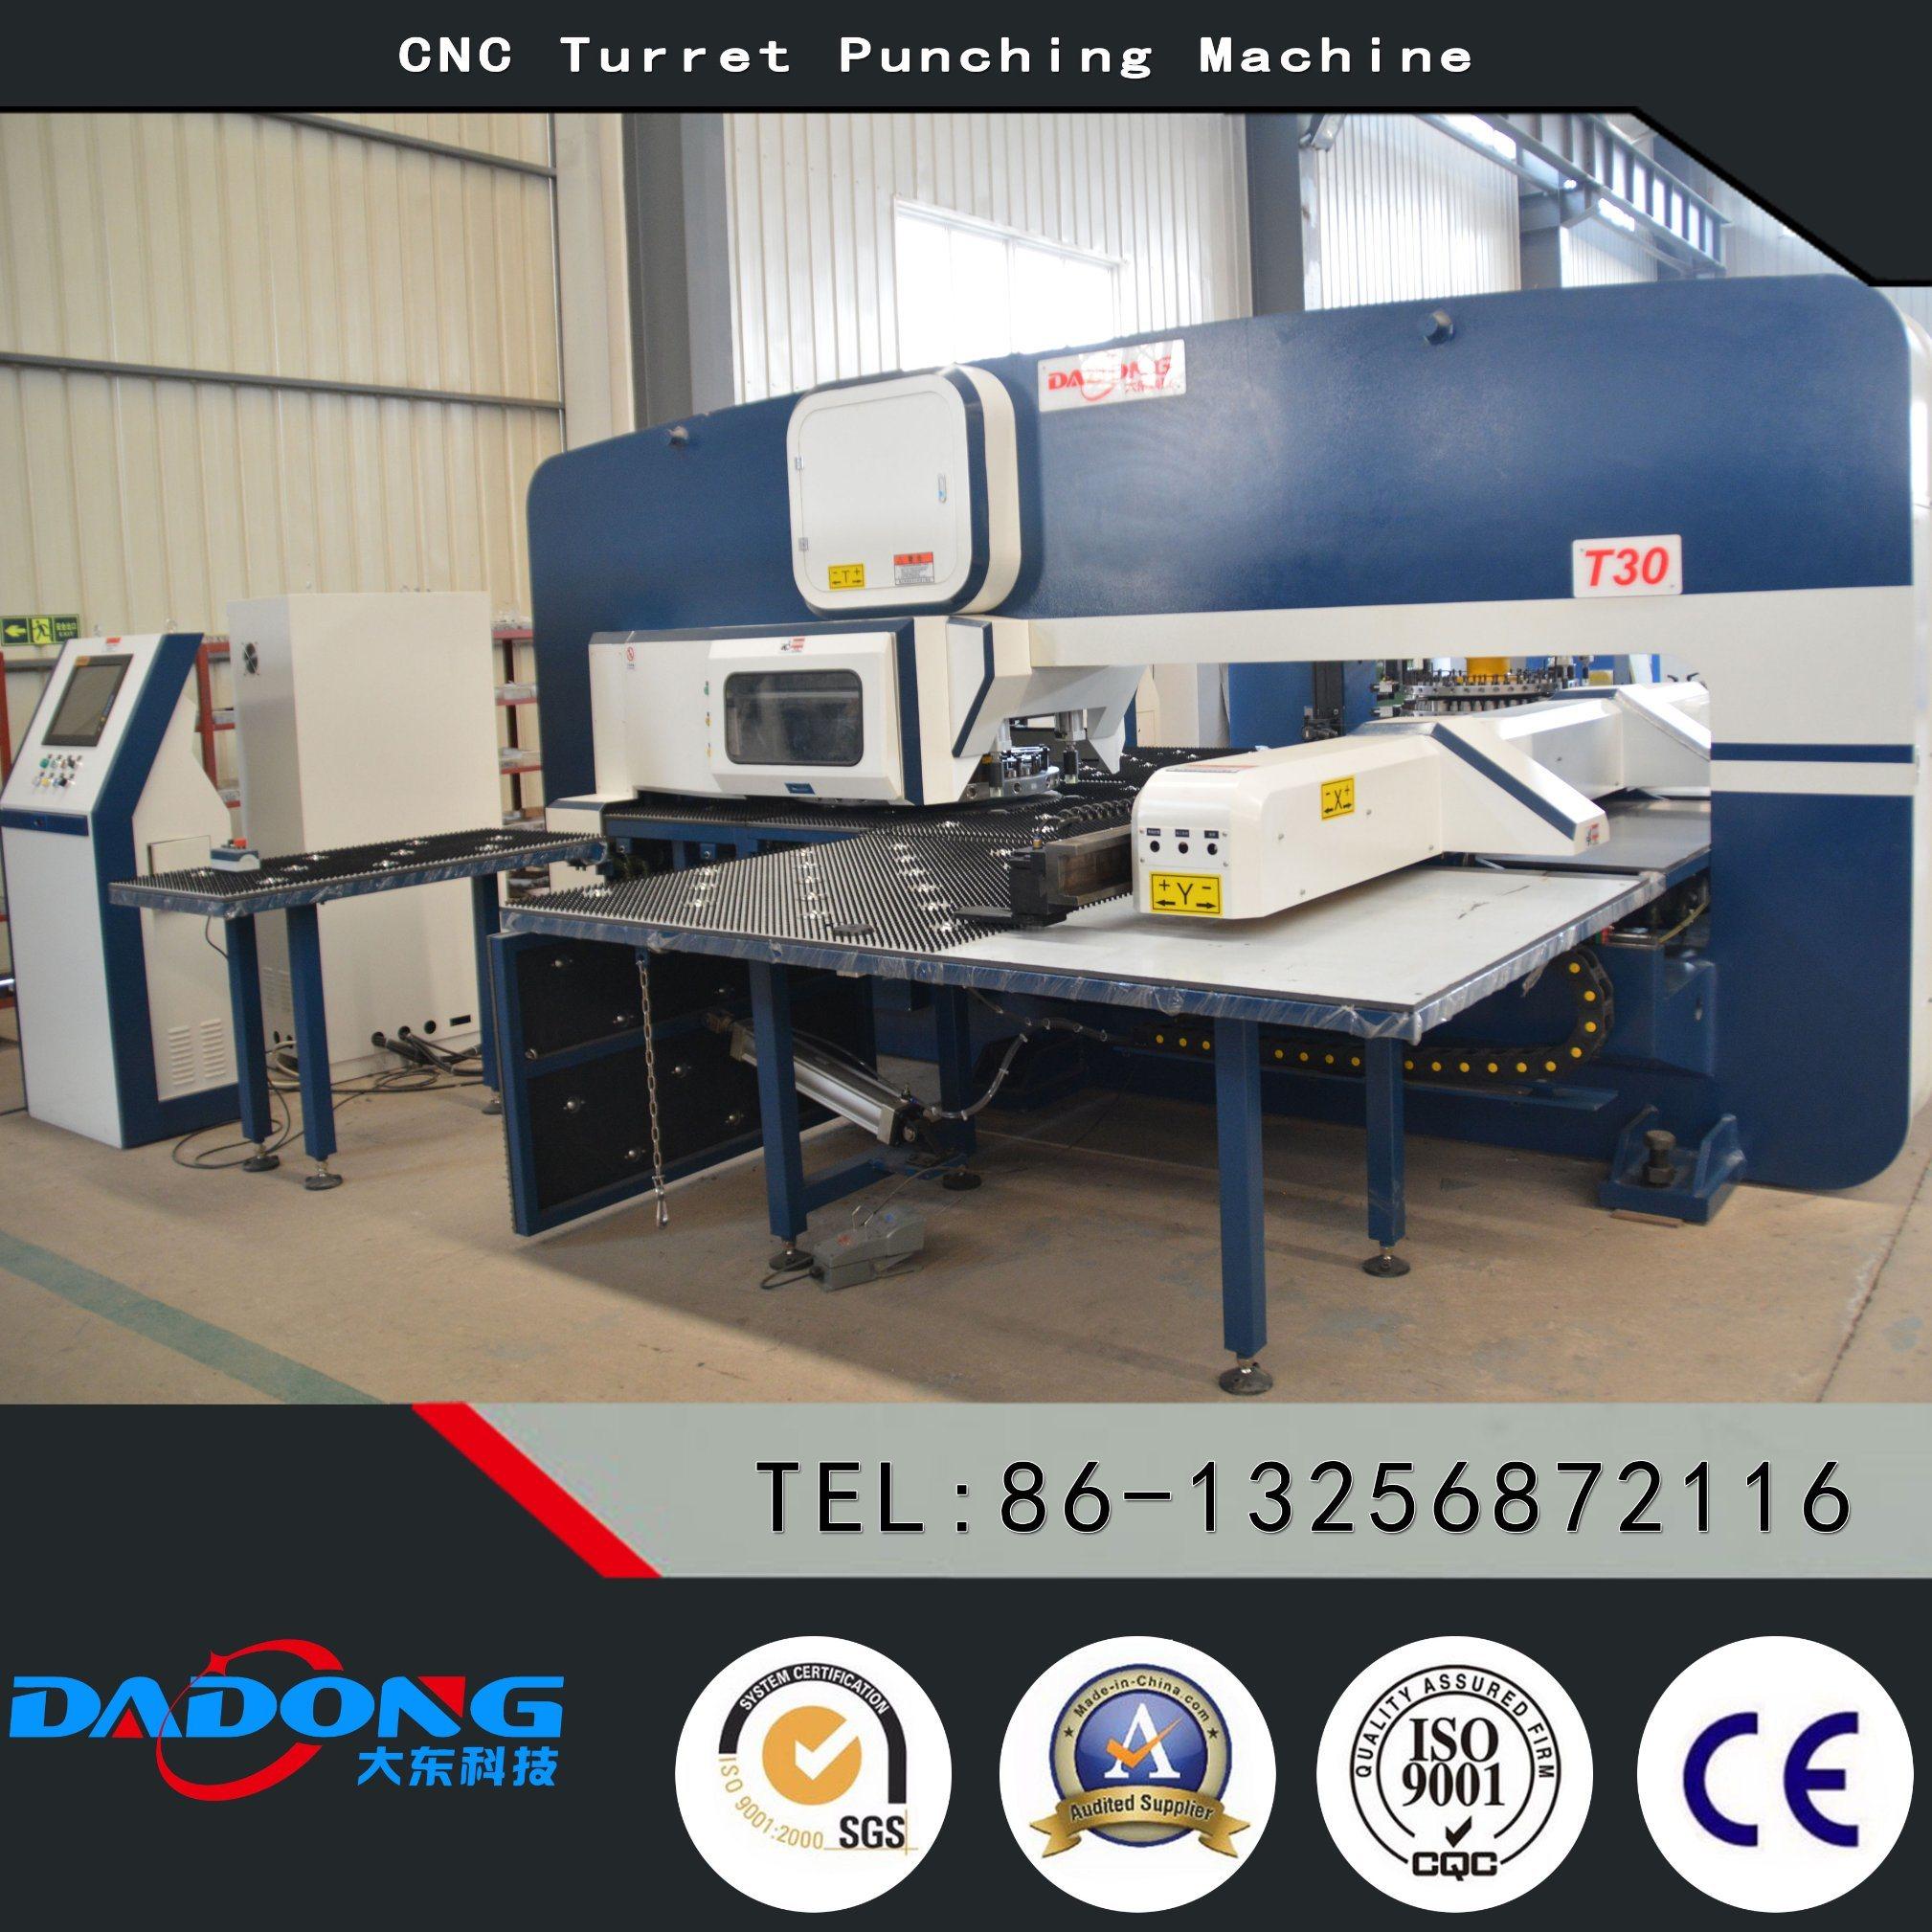 D-T30 Siemens/Fanuc System CNC Turret Punching Machine/Punch Press